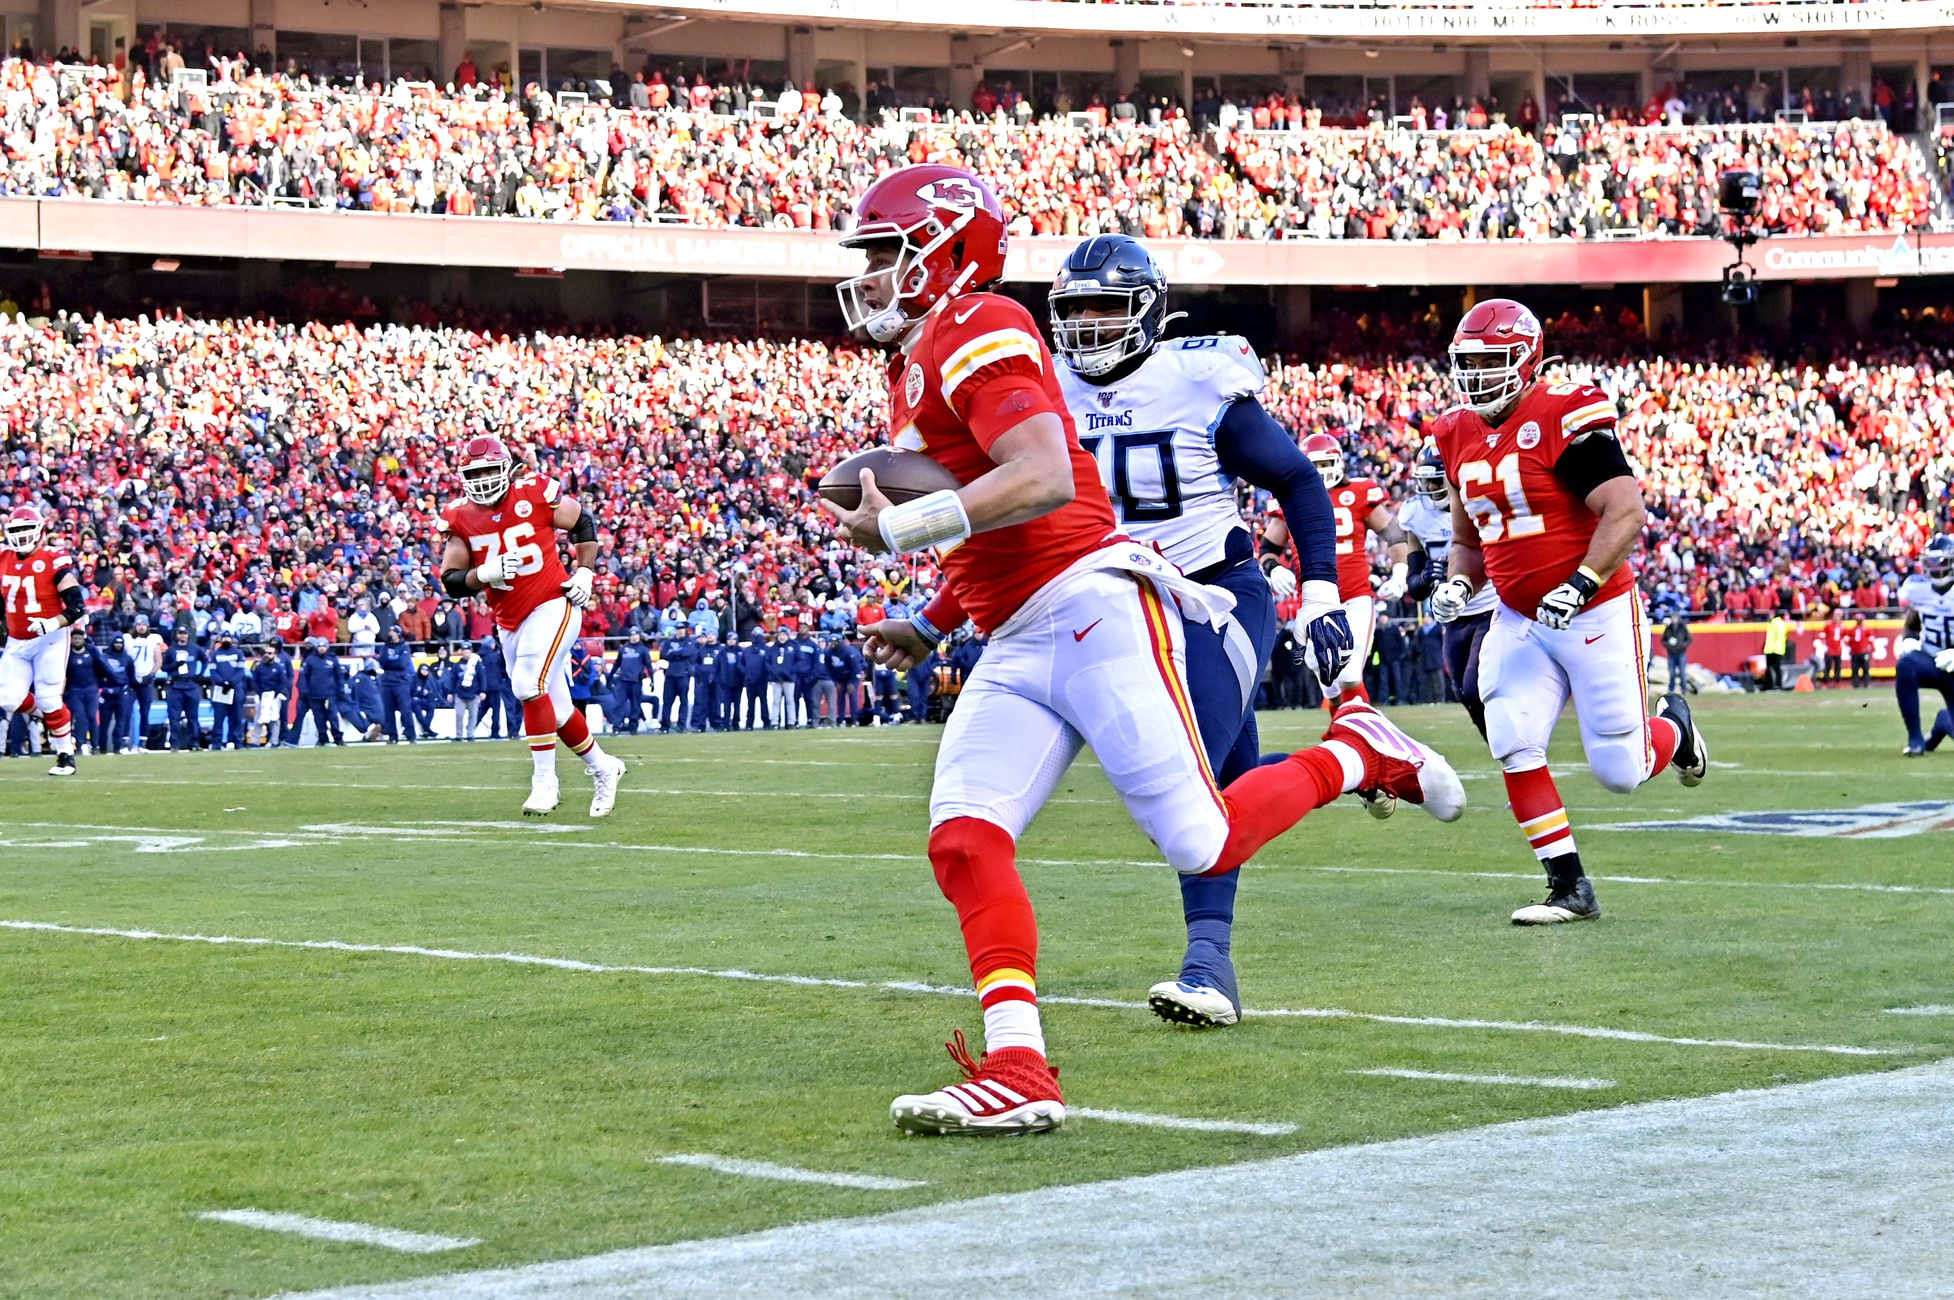 """The Run"" Shows Chiefs' Patrick Mahomes Has Green Light to Scramble"